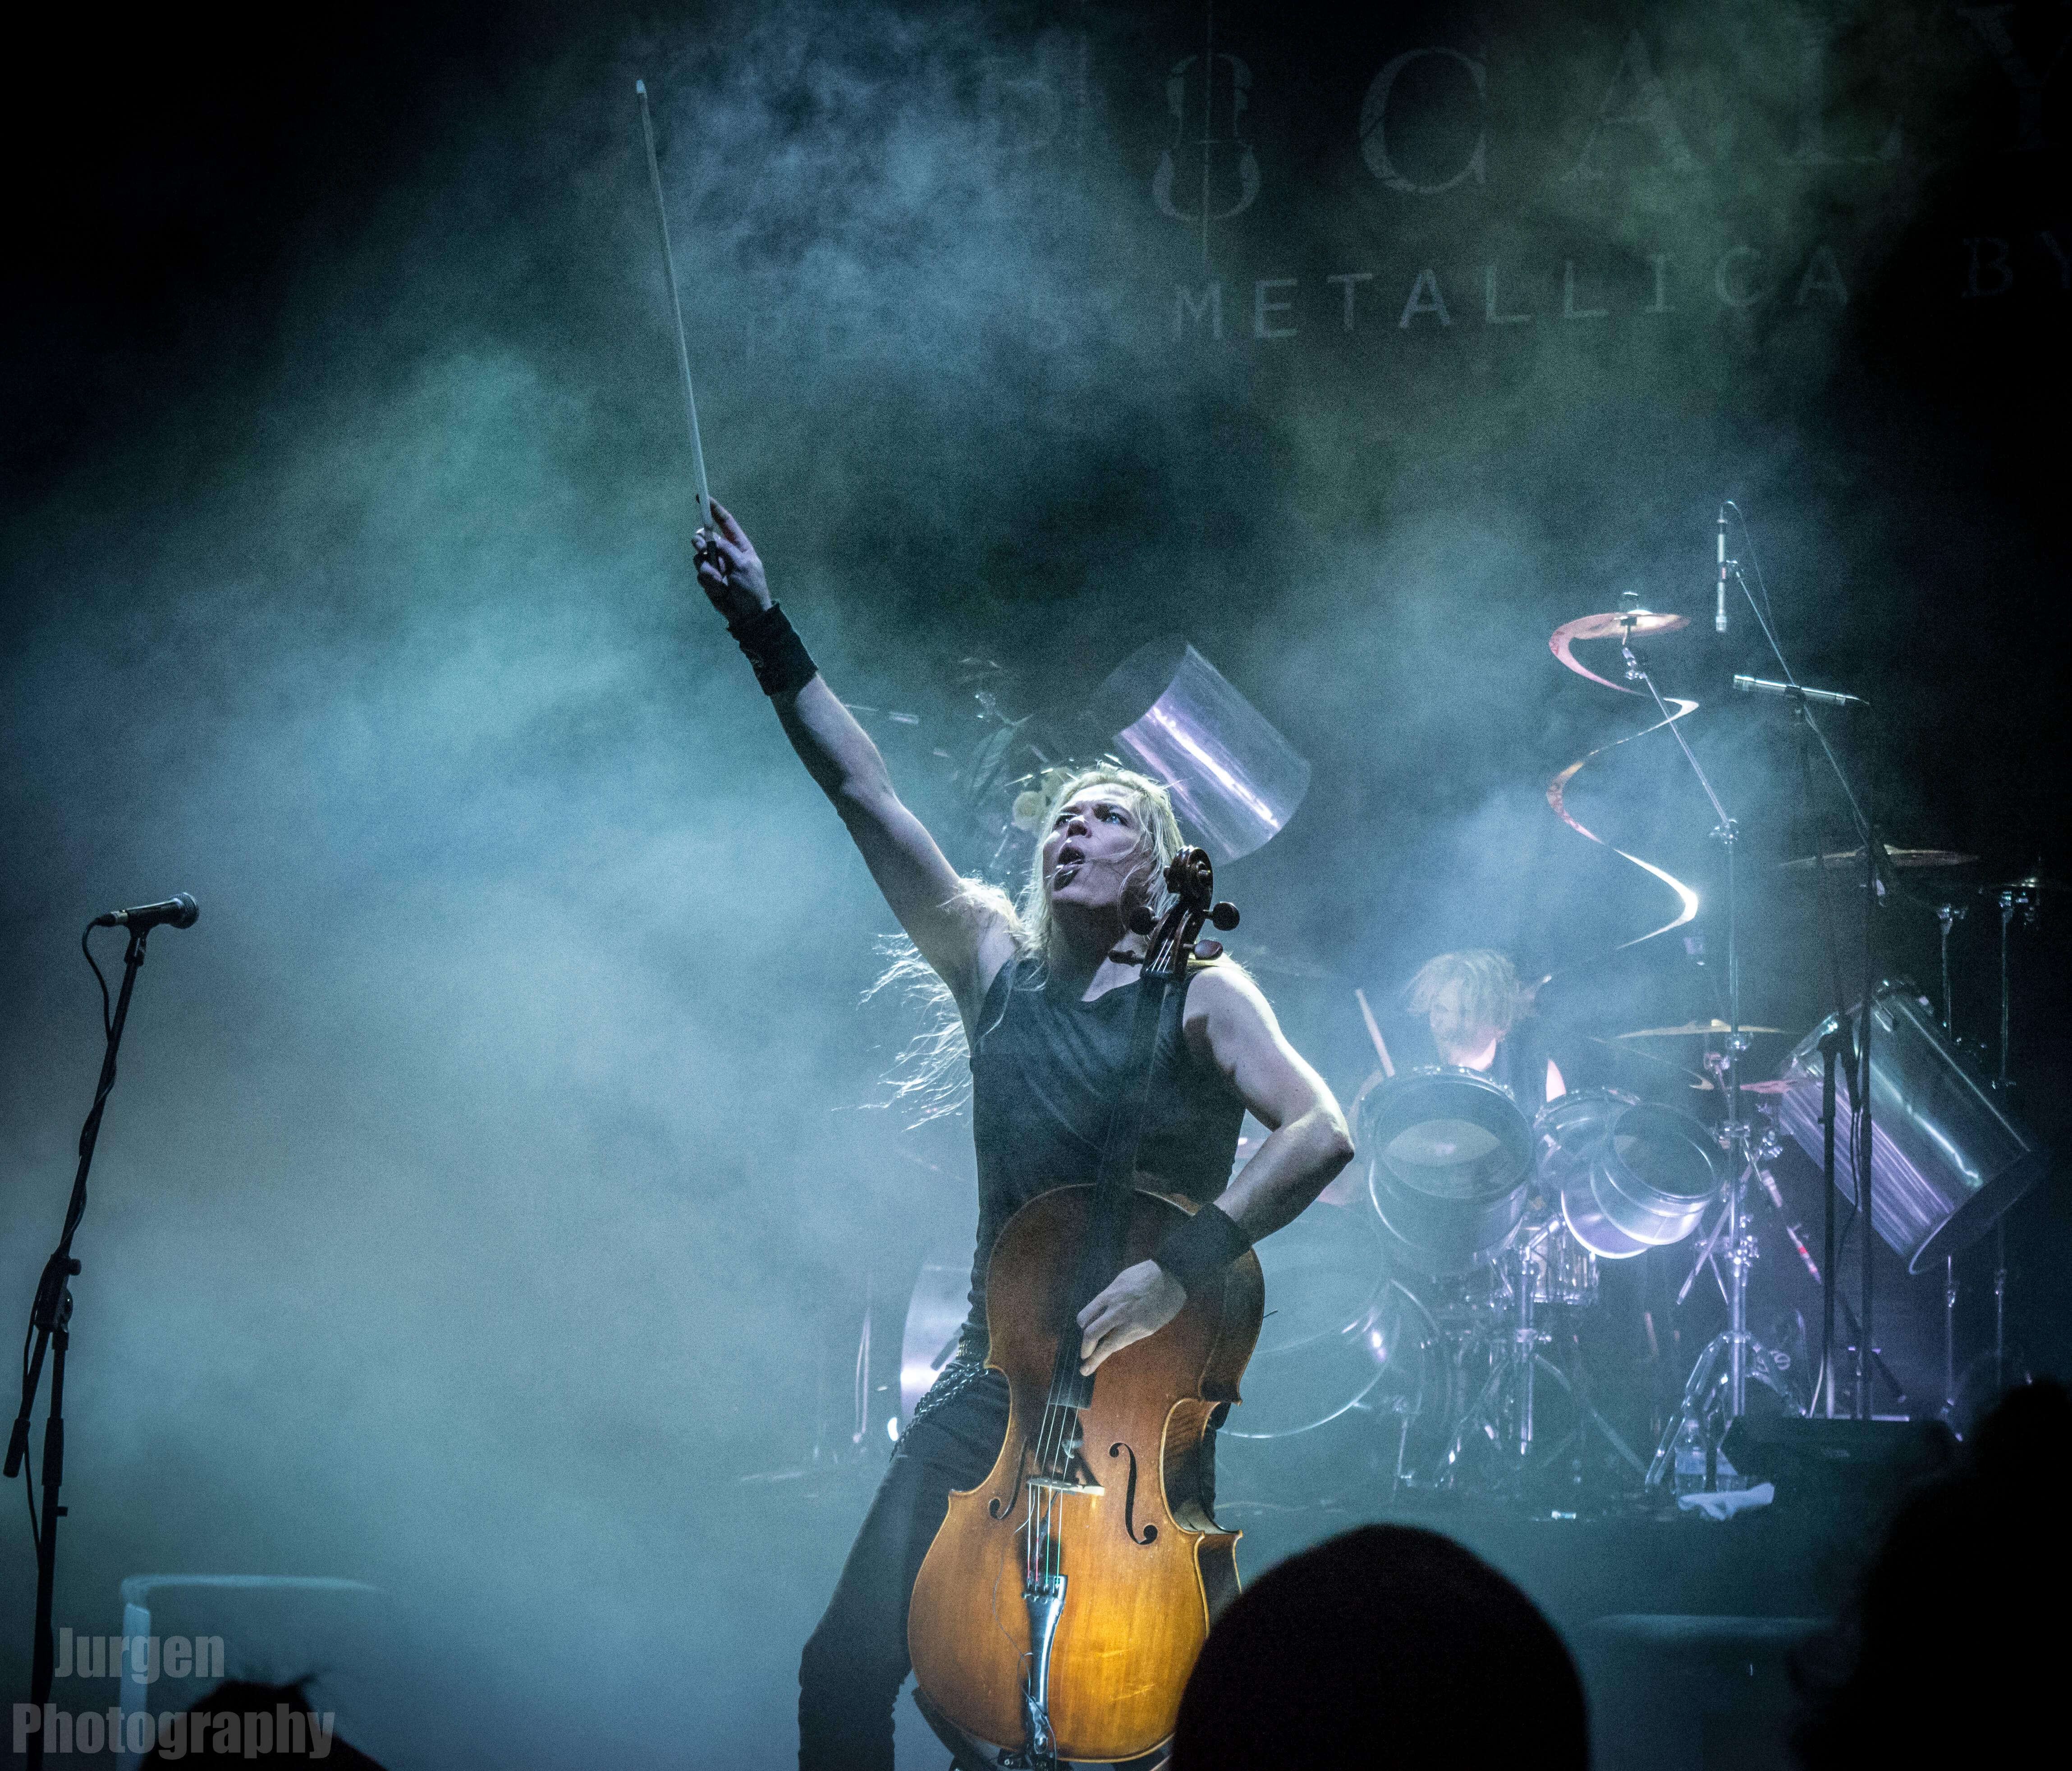 Apocalyptica by Jurgen Photography